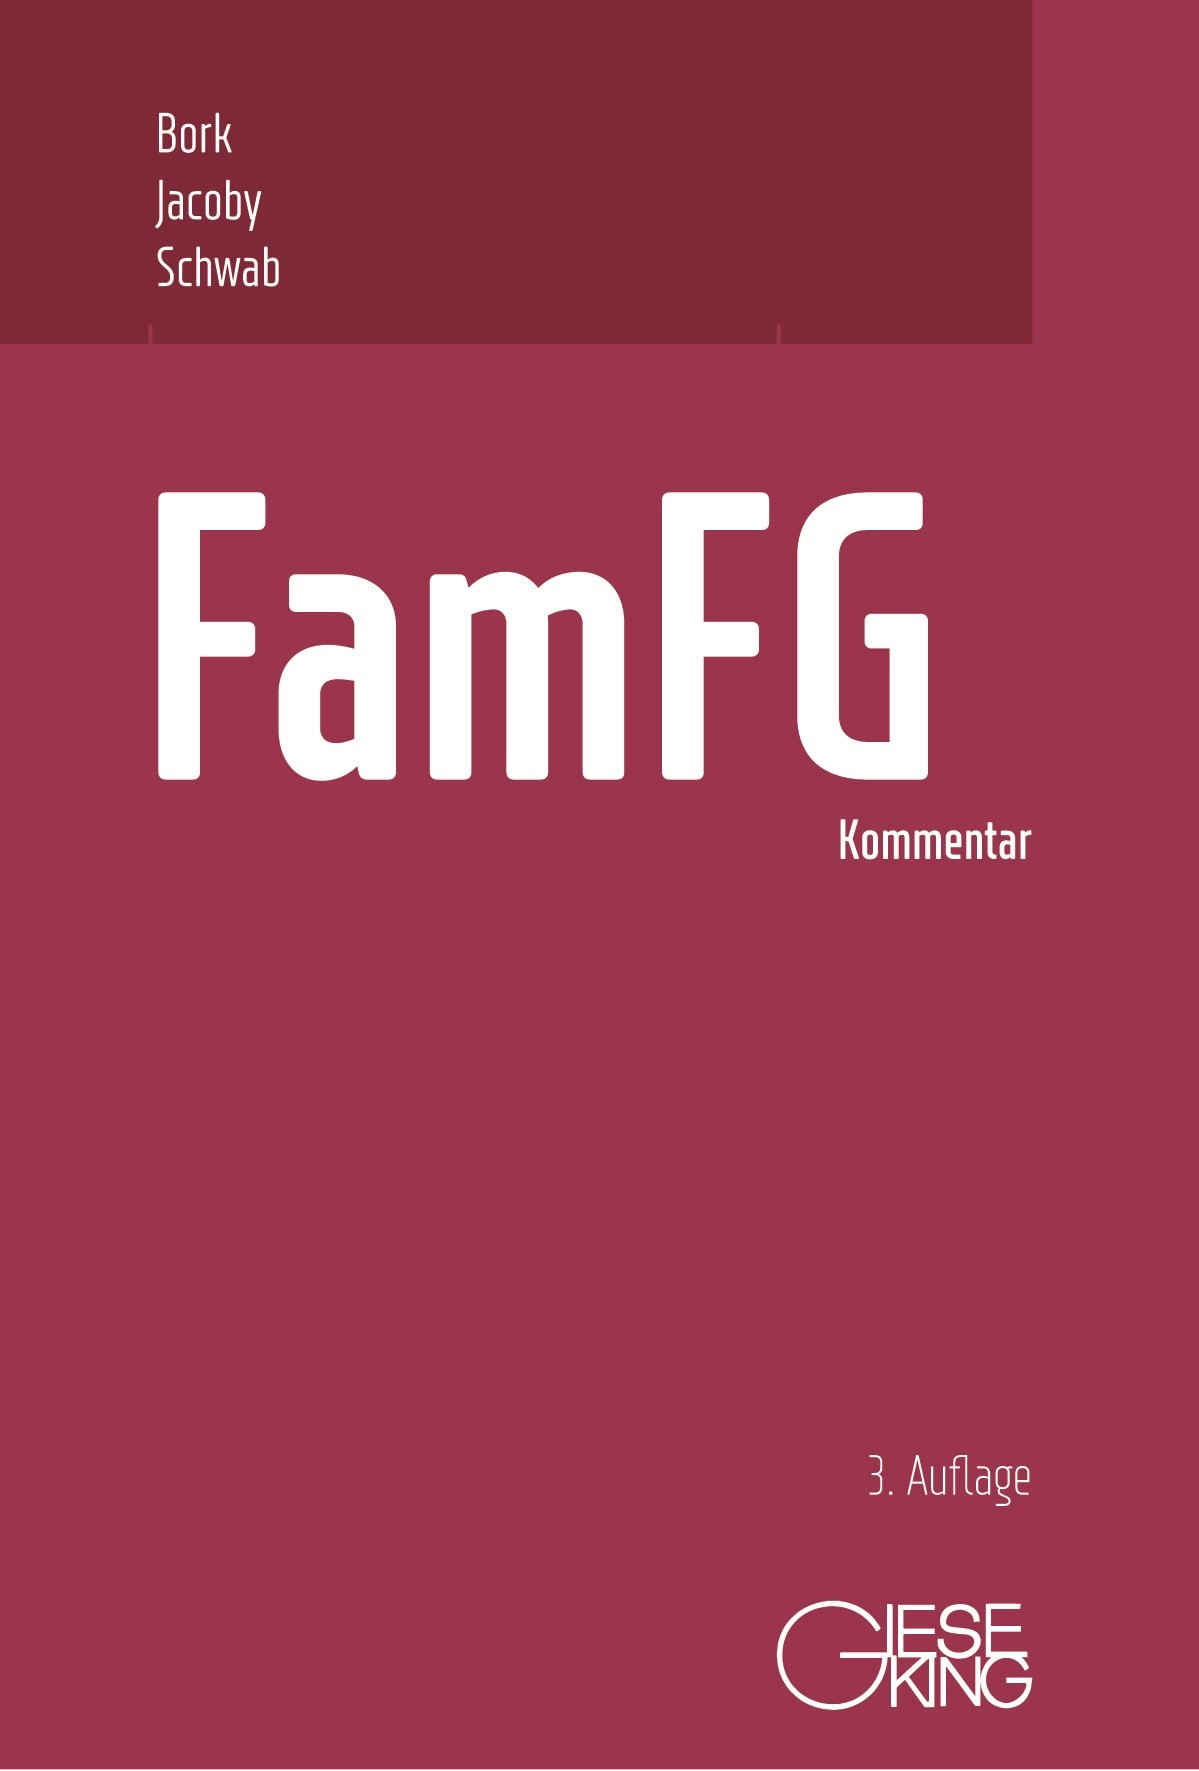 FamFG | Bork / Jacoby / Schwab (Hrsg.) | 3., neu bearbeitete Auflage, 2018 | Buch (Cover)